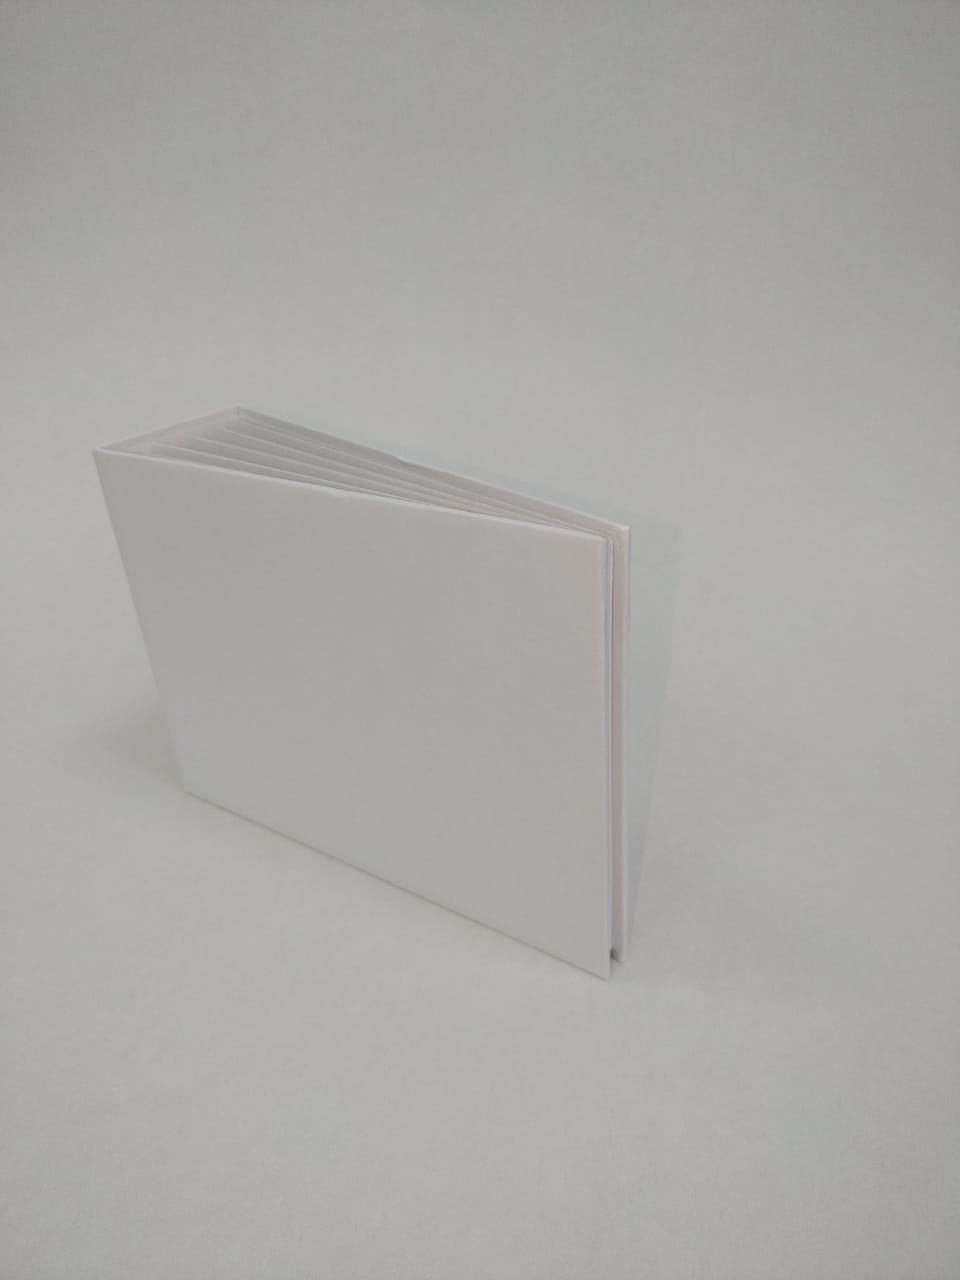 Álbum 12 x 17 com lombada Branco - JuJu Scrapbook  - JuJu Scrapbook